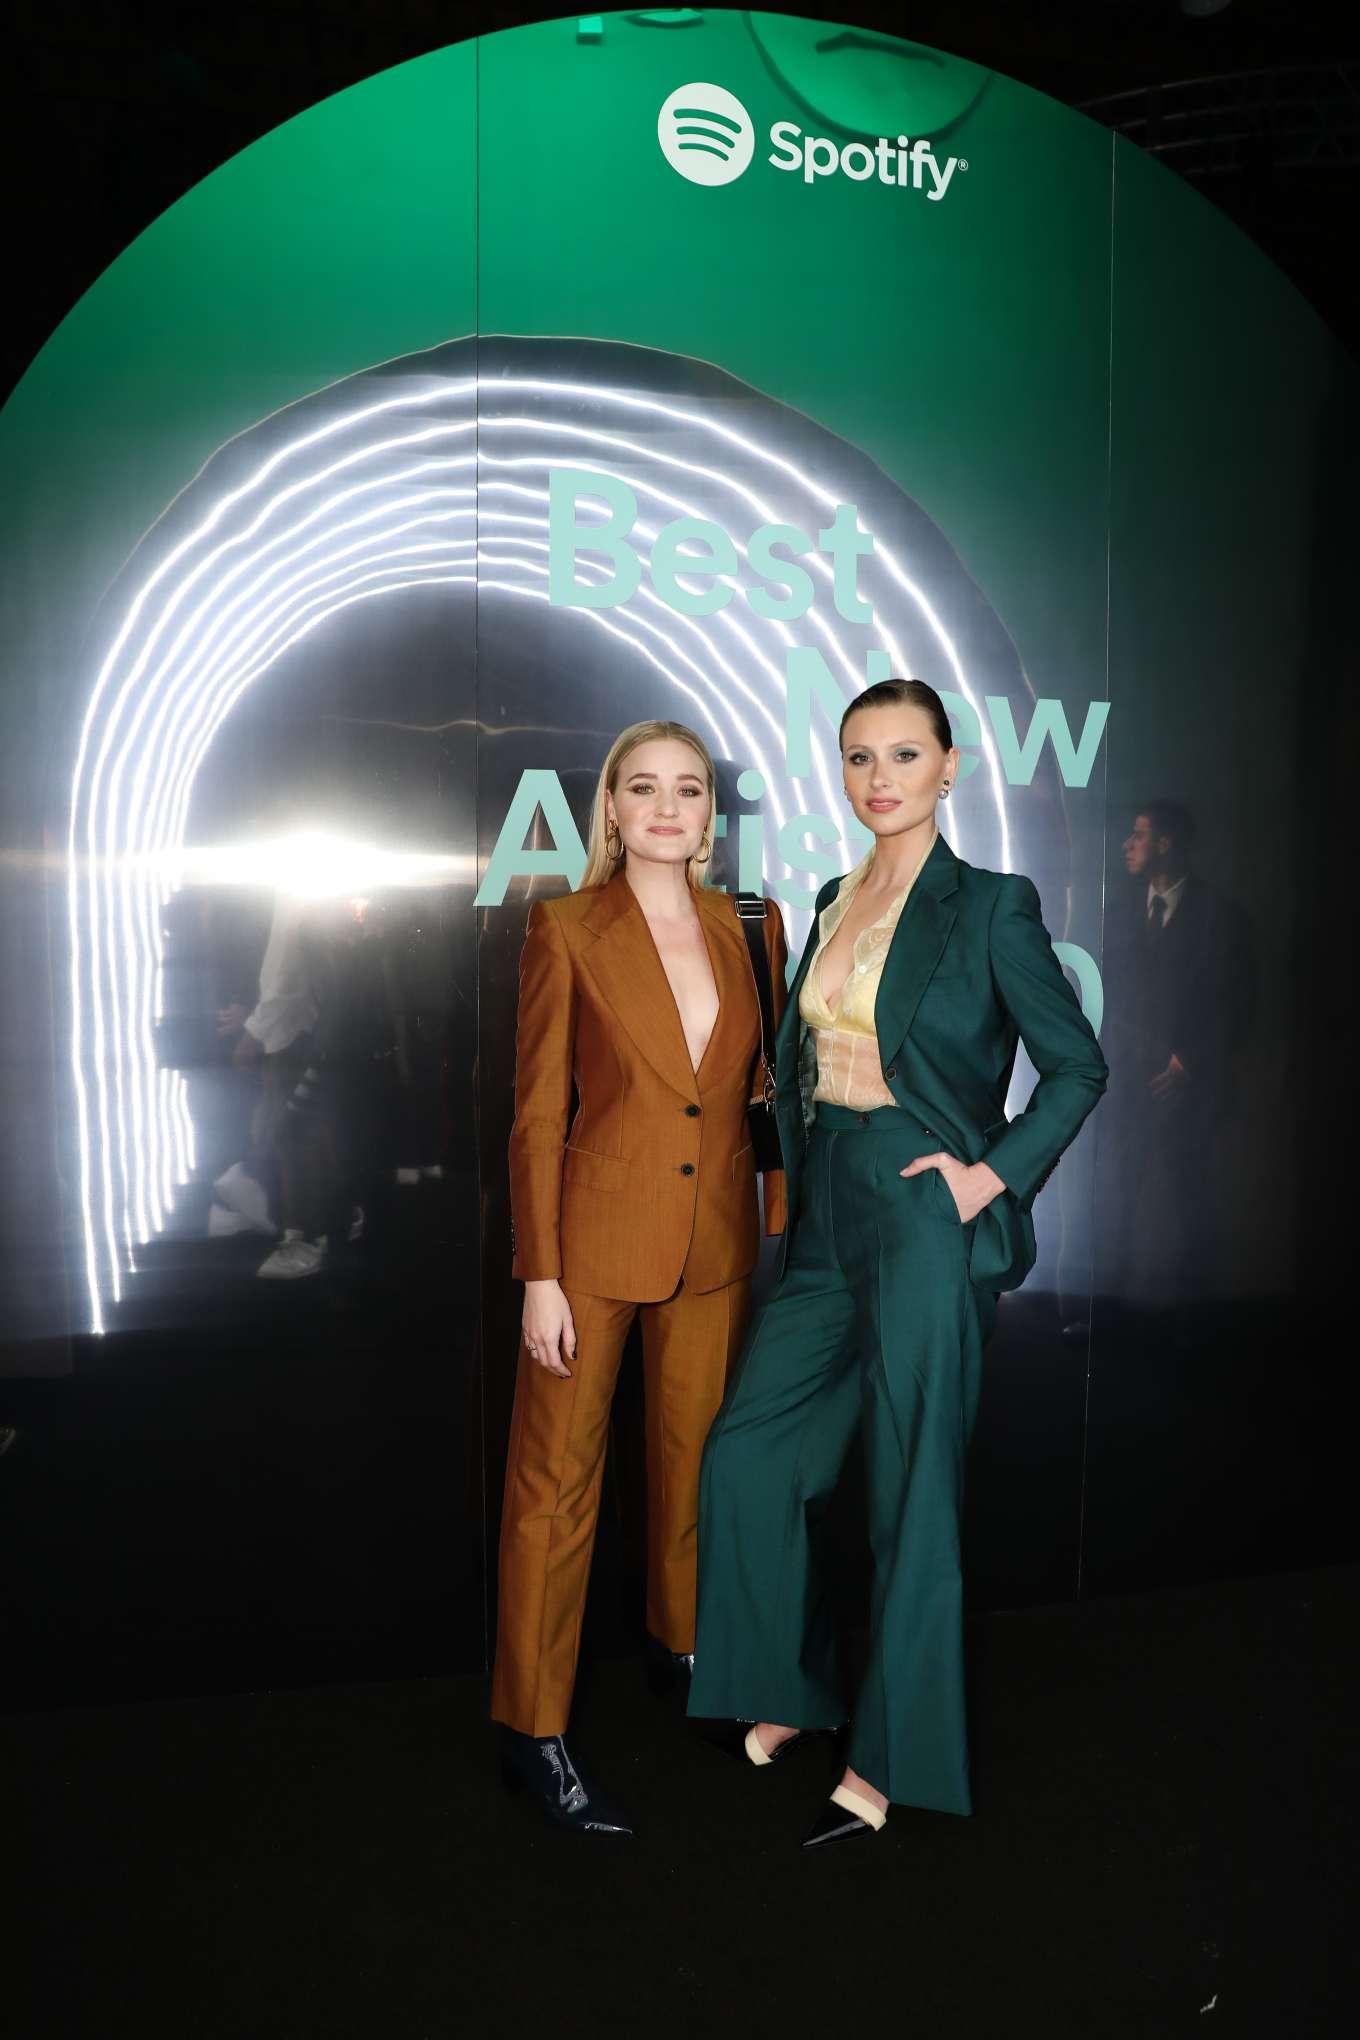 AJ Michalka 2020 : AJ Michalka and Aly Michalka – Spotify Best New Artist Party-08